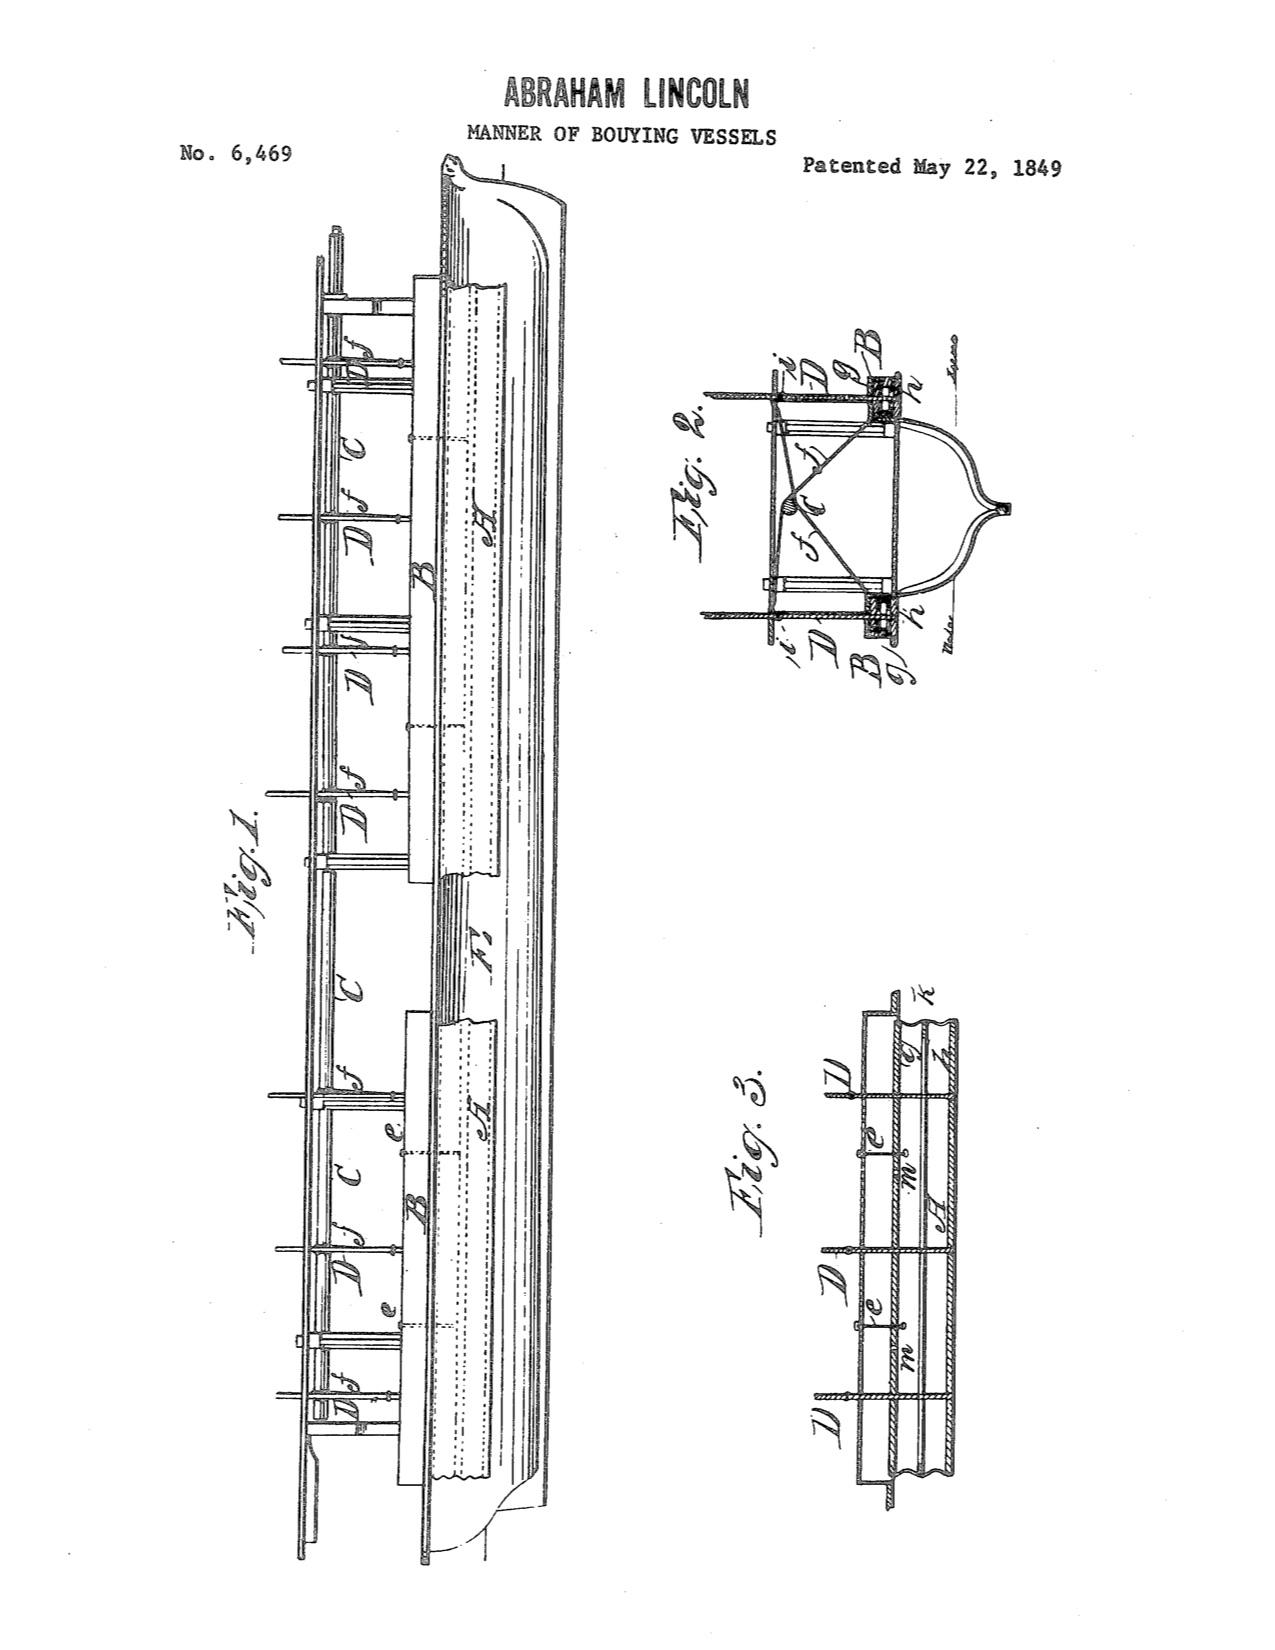 Abraham Lincoln's patent